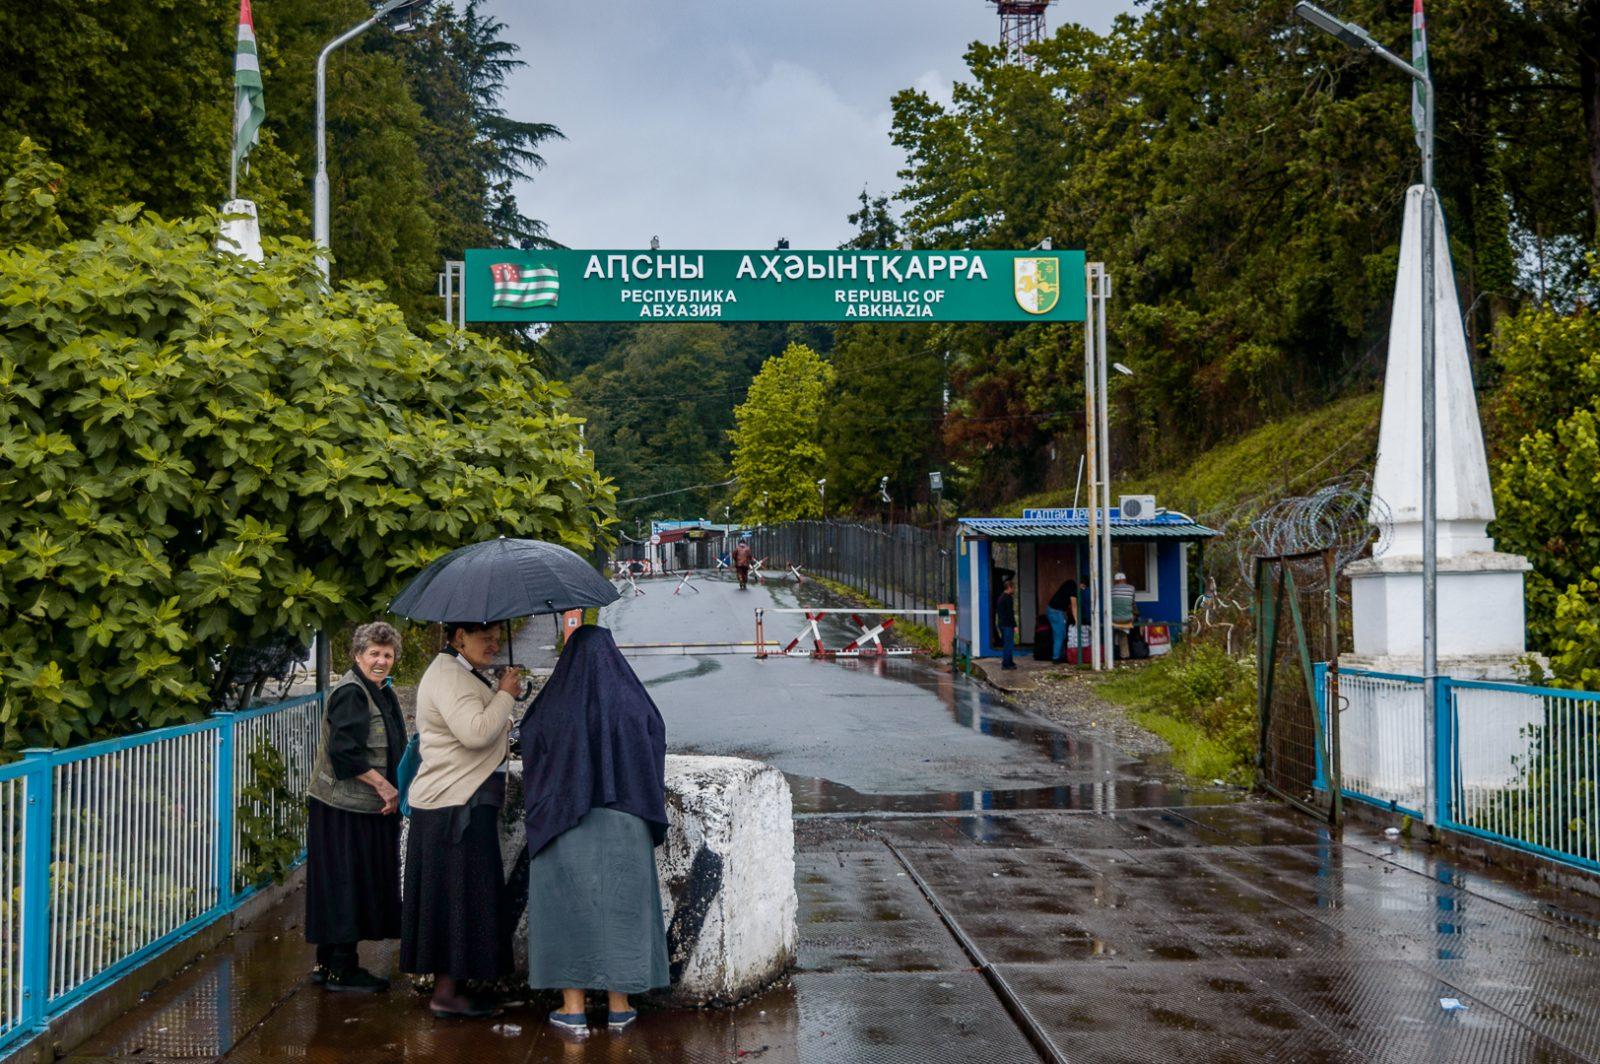 Abcházie - urbex nebo temná turistika